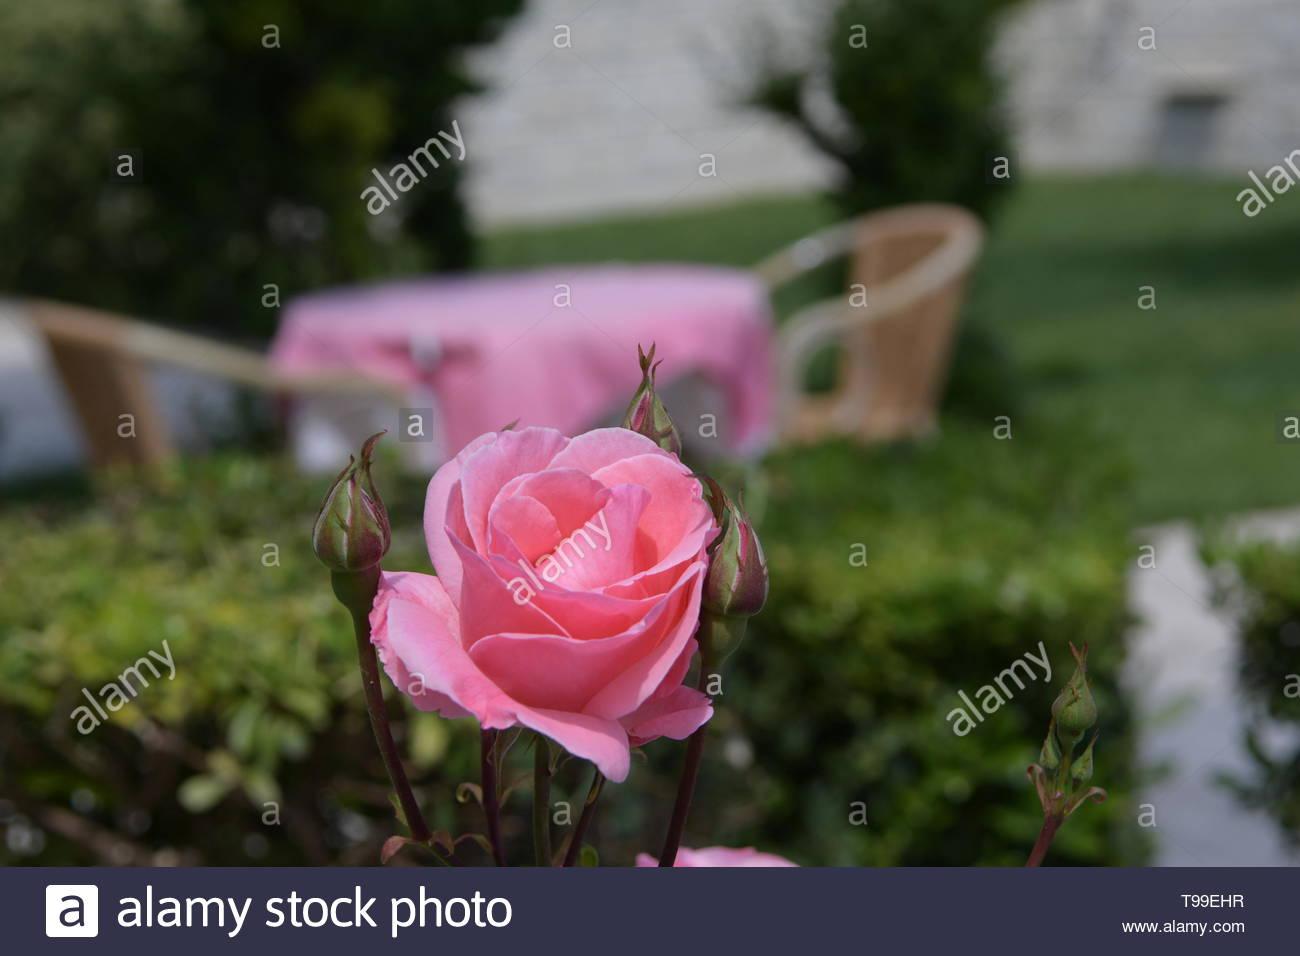 Turkey Pamukkale pink rose in Hal-Tur hotel terrace garden Stock Photo